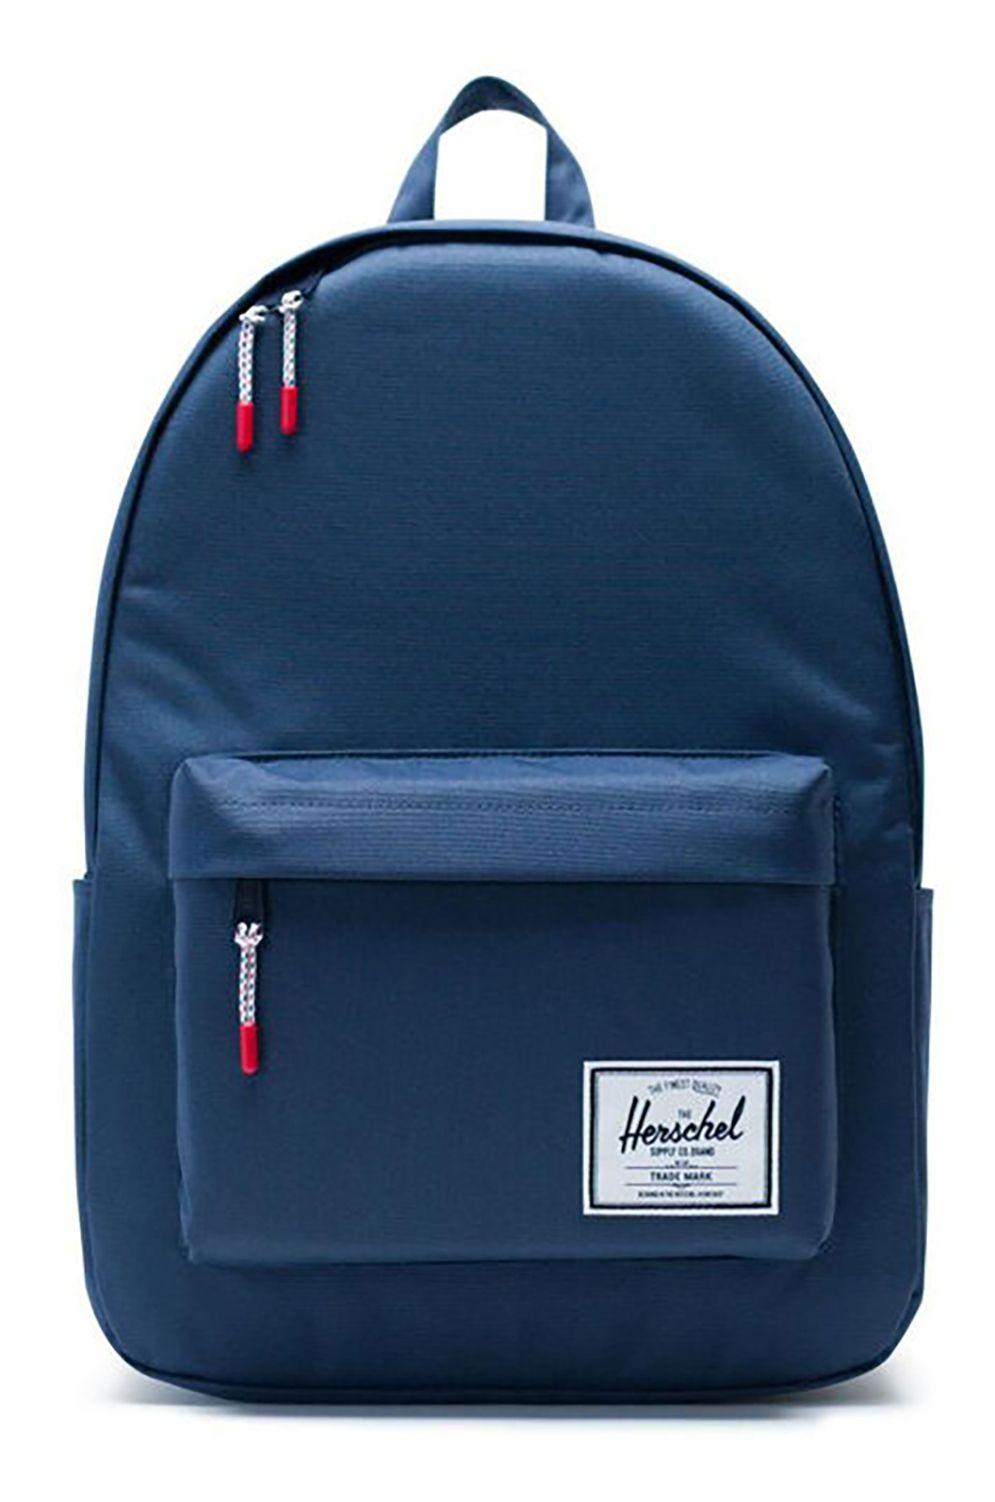 Herschel Backpack CLASSIC X-LARGE Navy